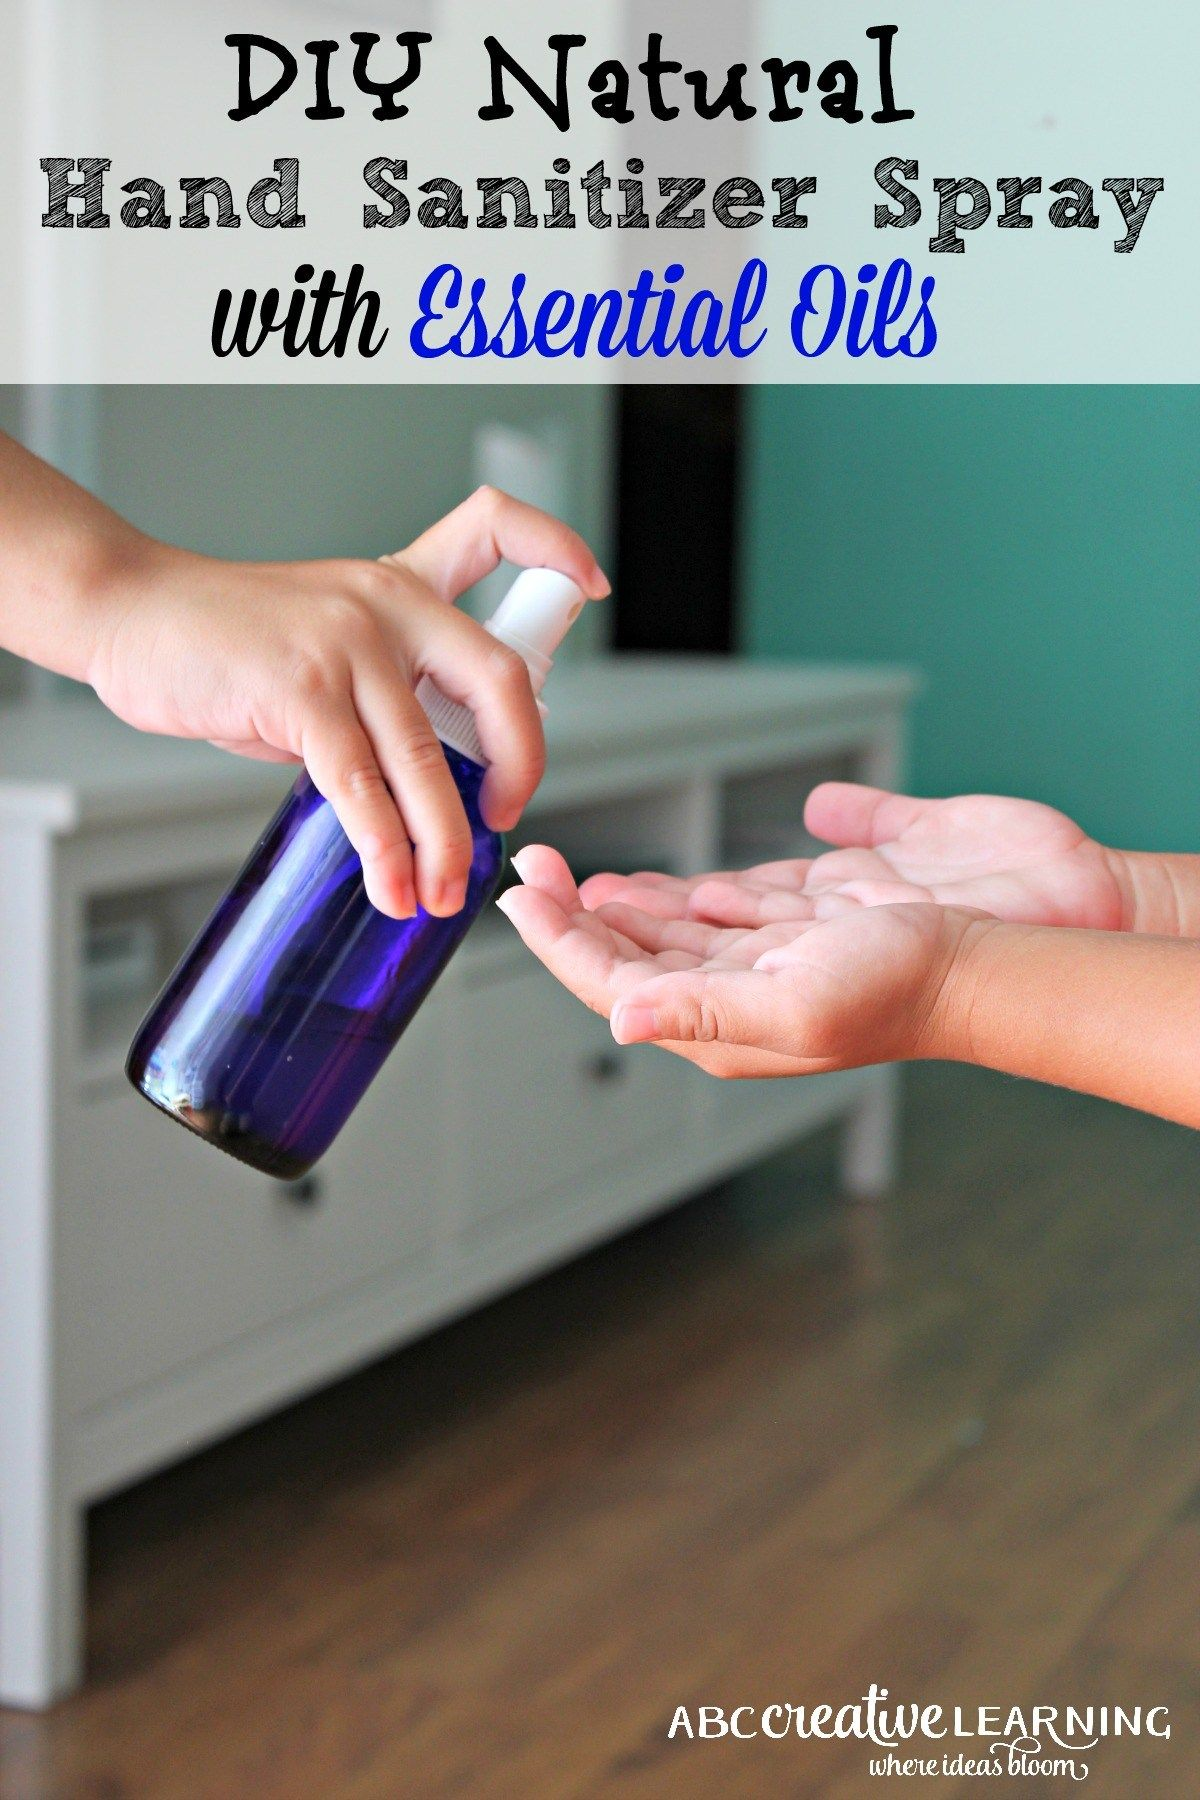 Diy Natural Hand Sanitizer Spray Natural Hand Sanitizer